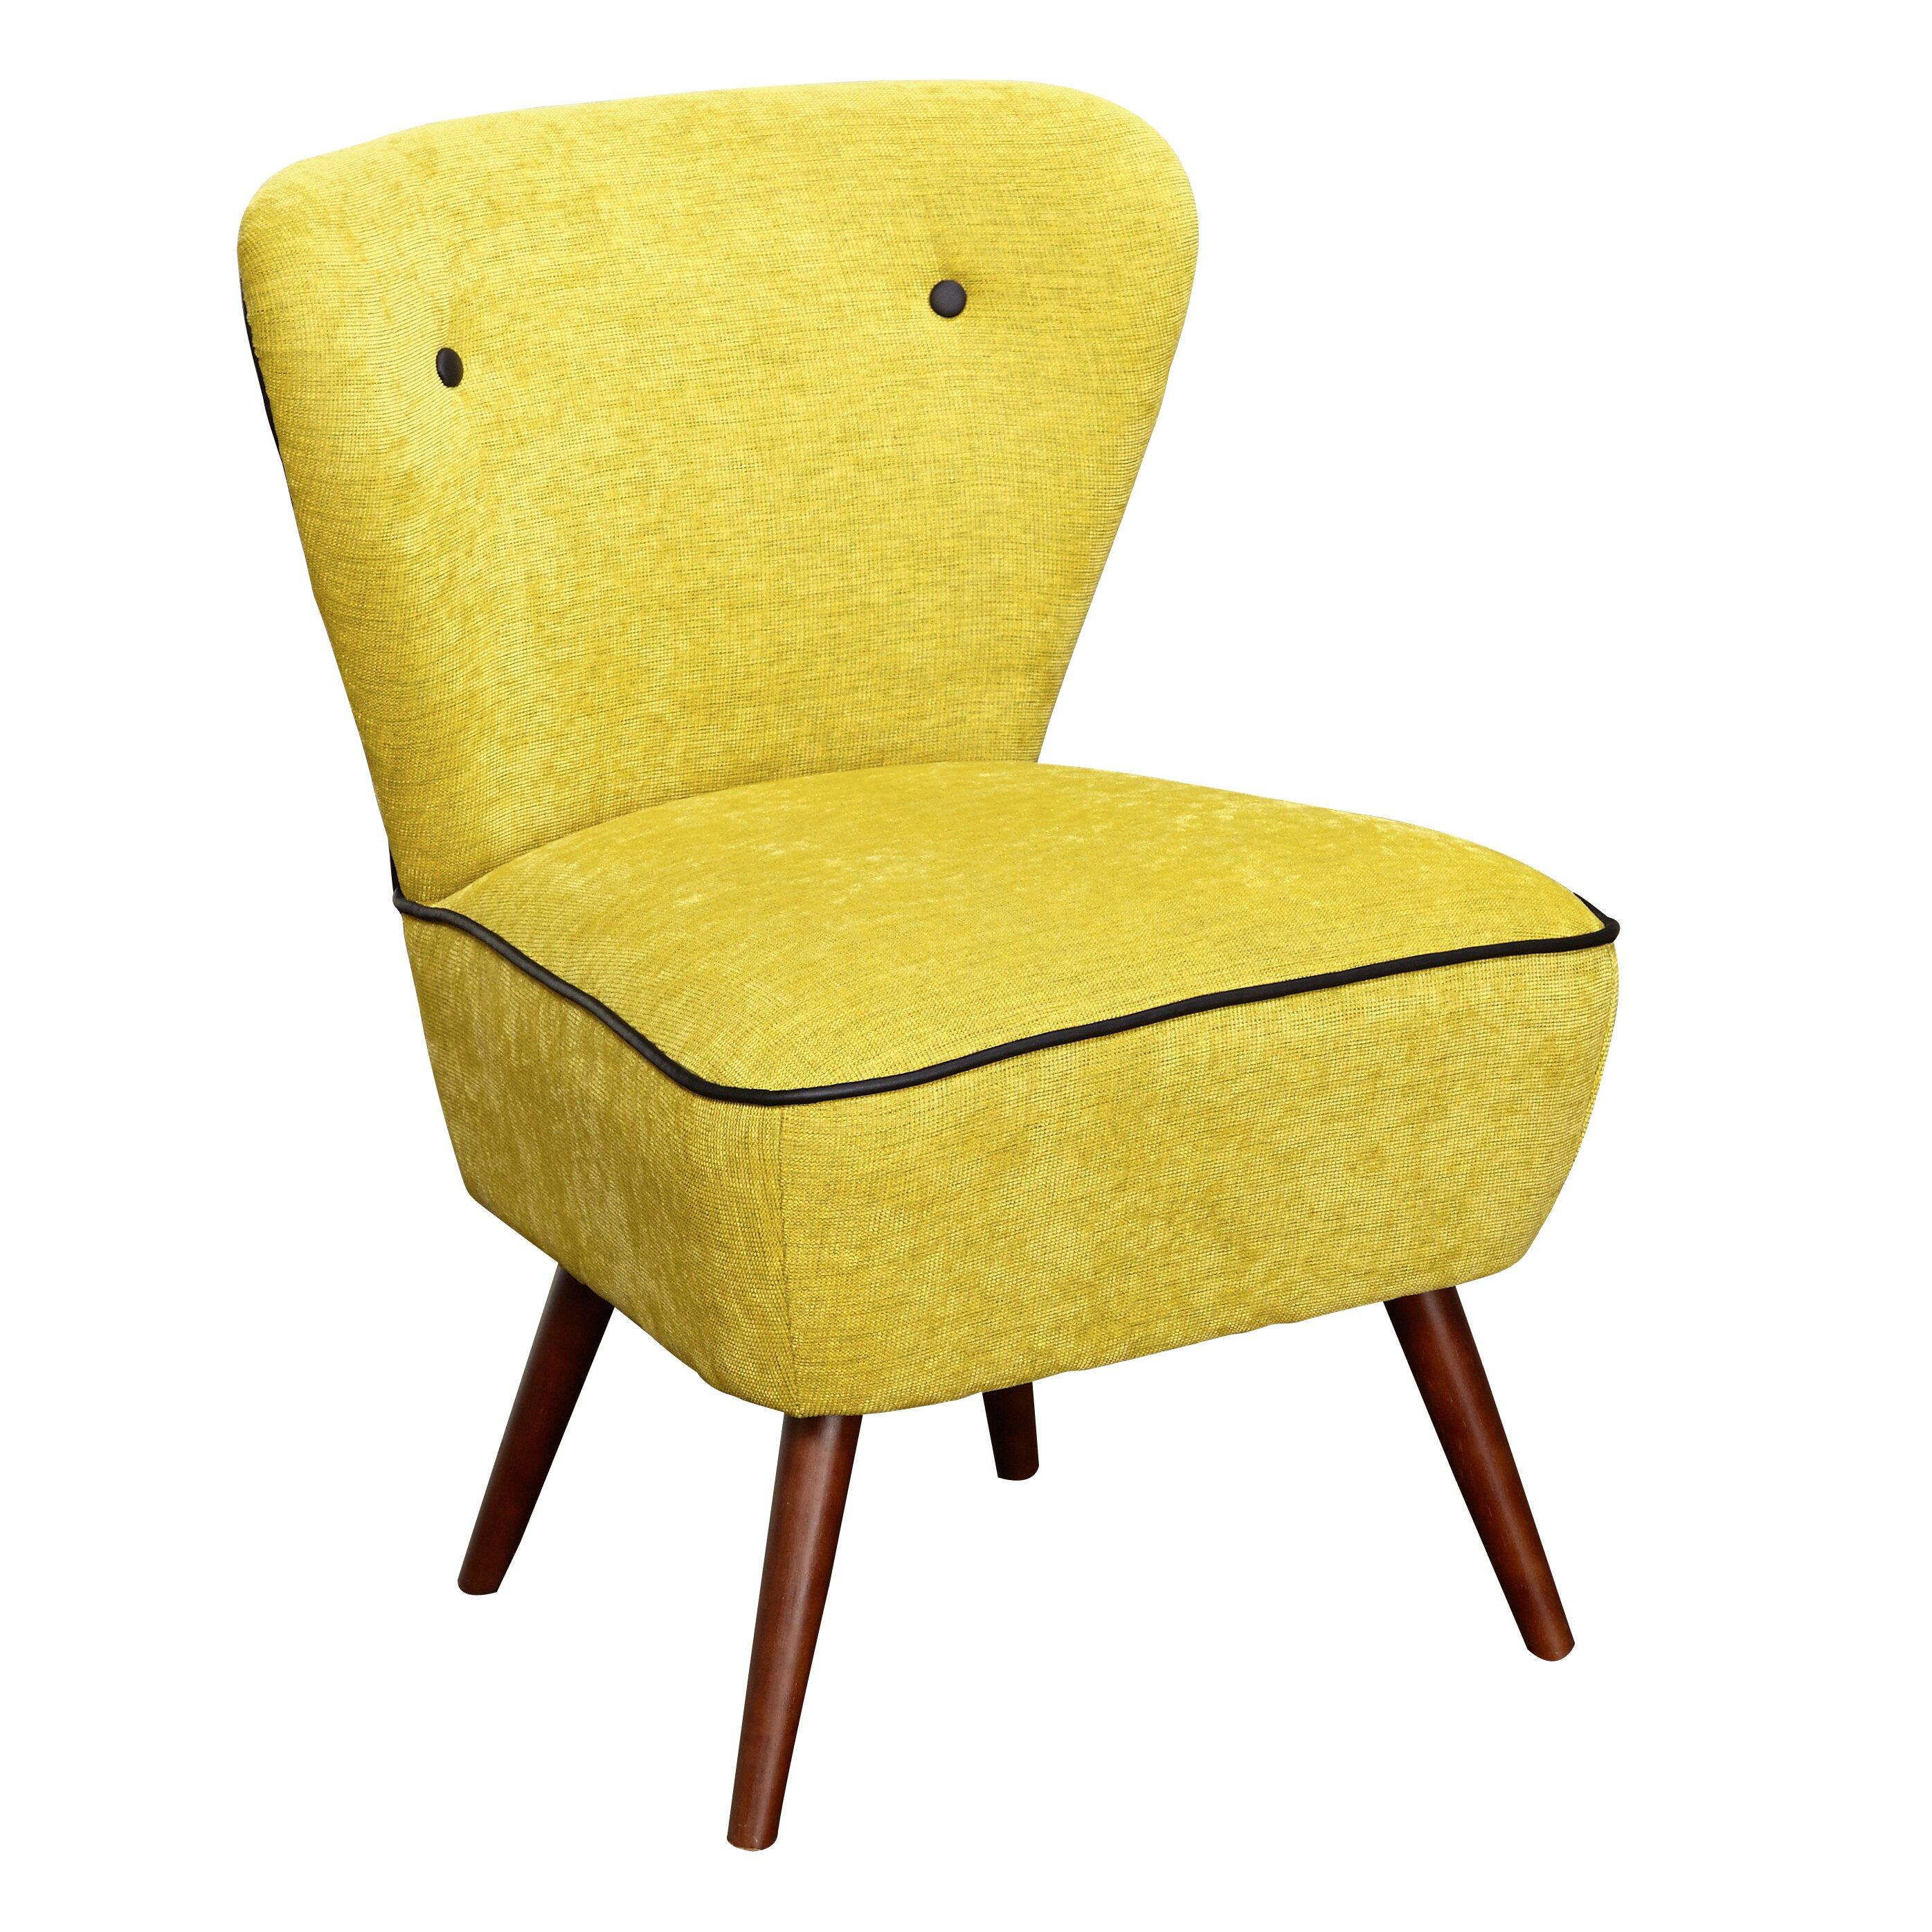 Langley street portland slipper chair reviews wayfair for Slipper chair